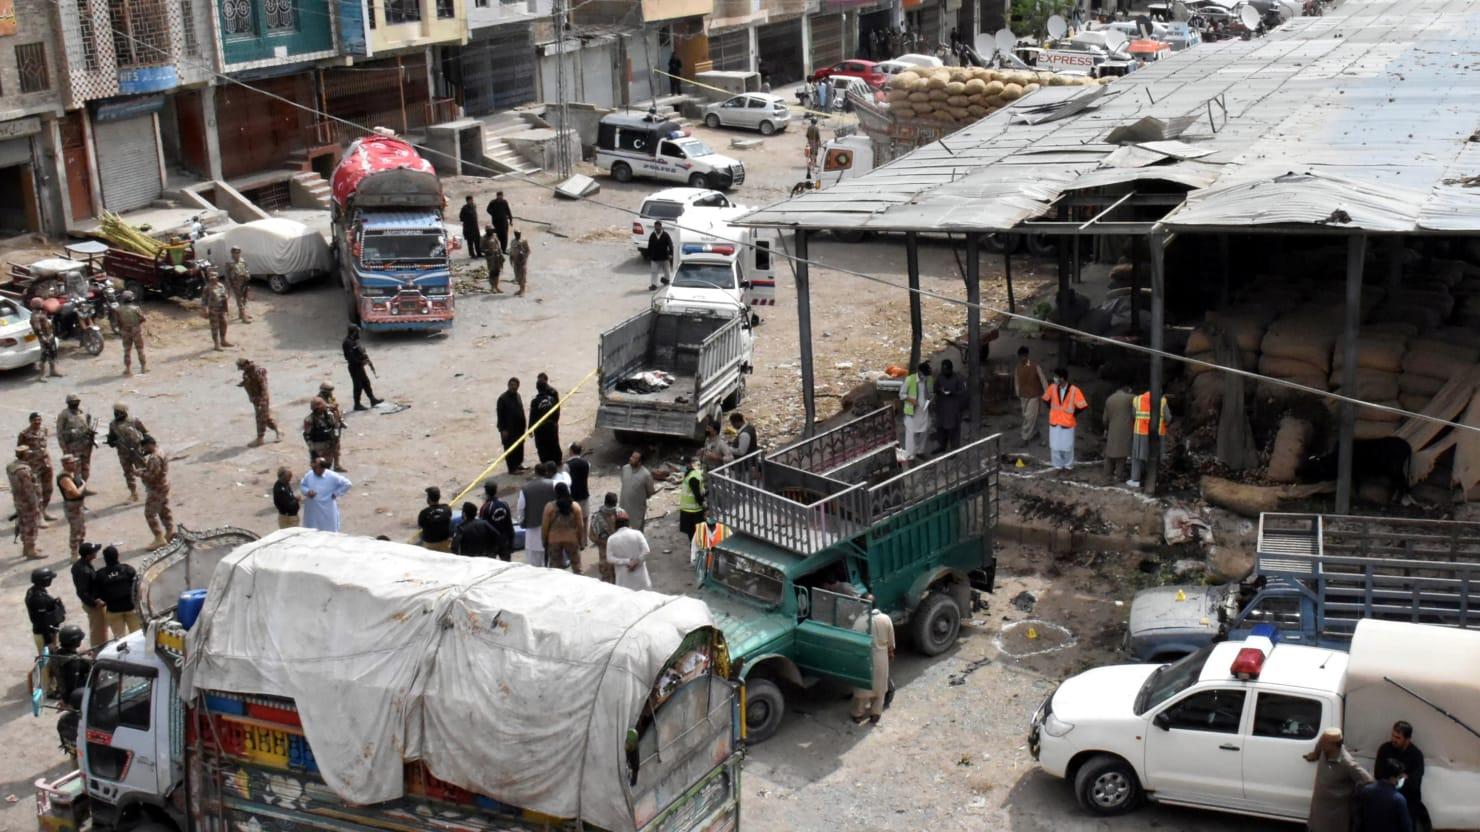 Bomb 'Hidden in Sack of Potatoes' Kills at Least 20 in Pakistan